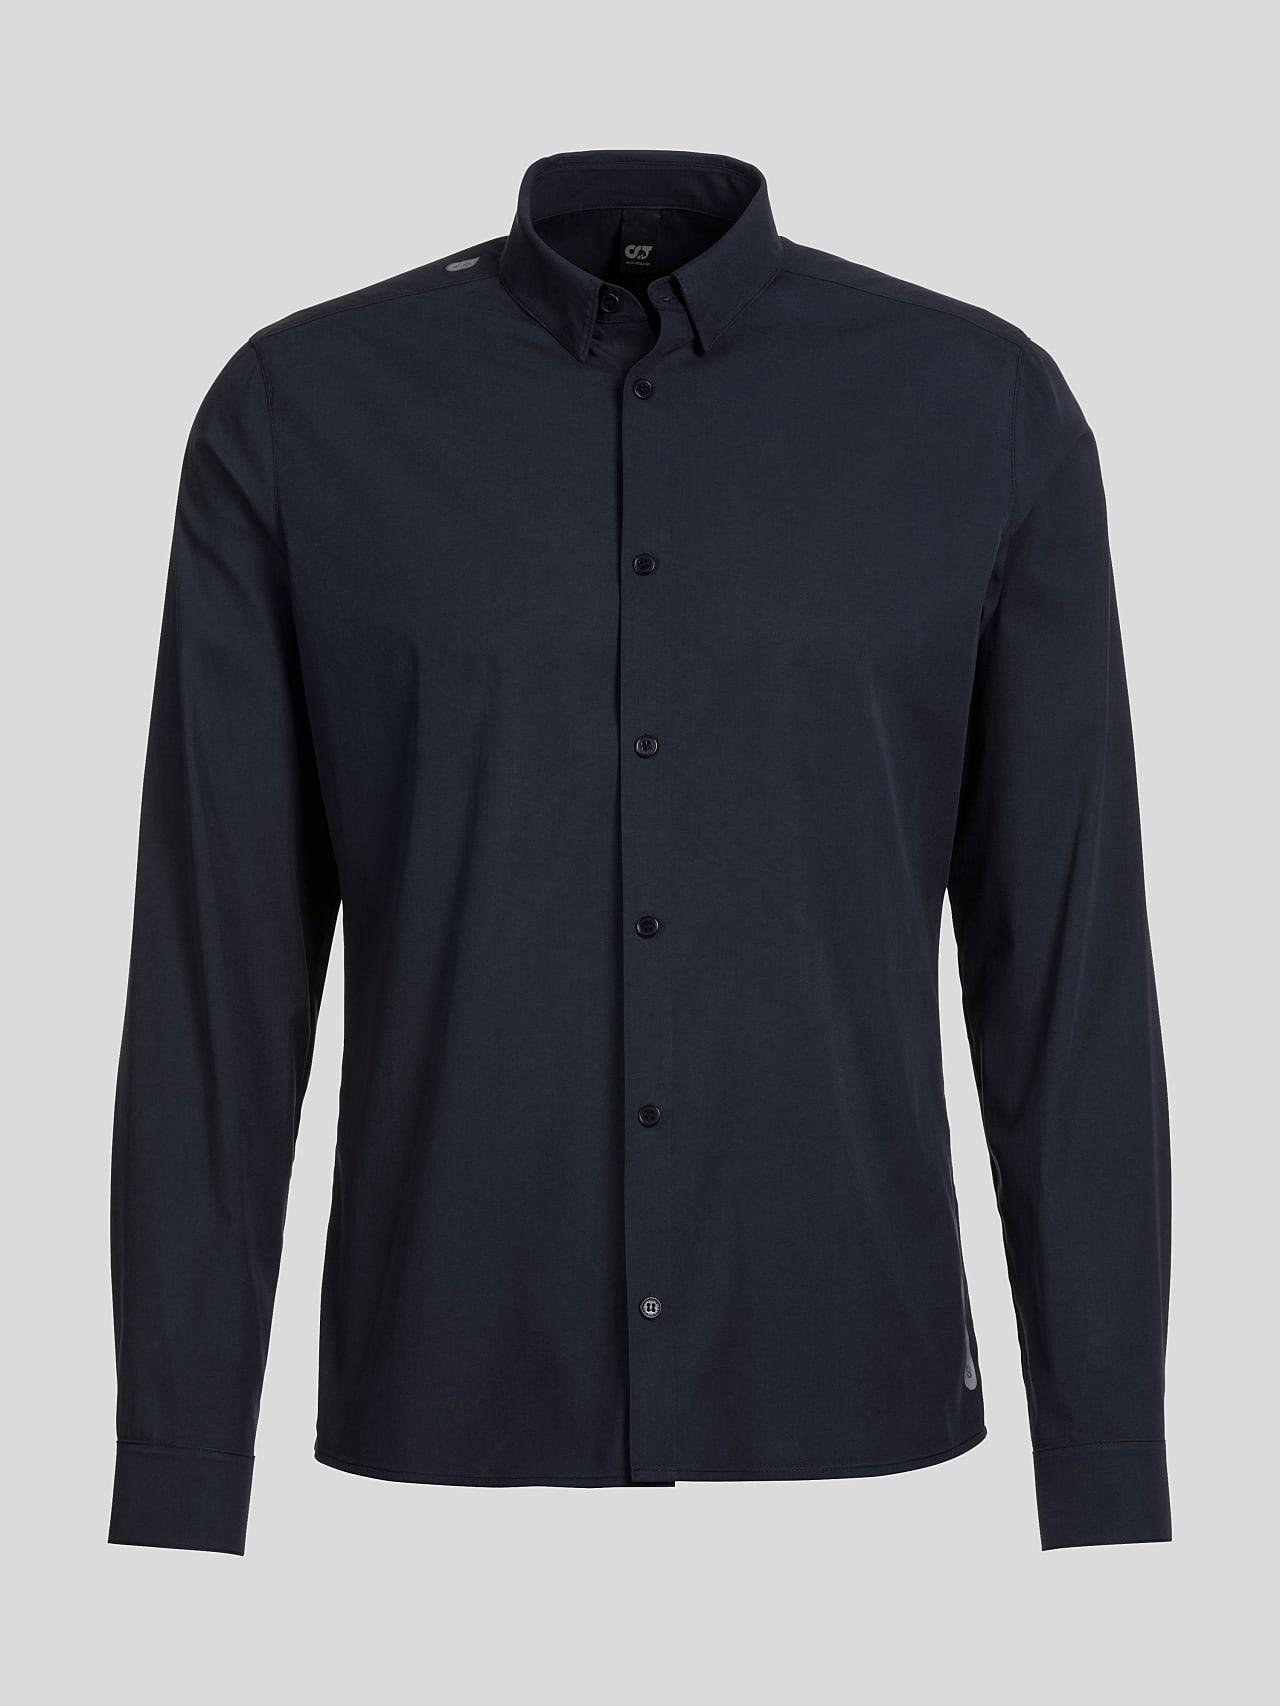 WAARG V1.Y5.01 Cotton-Stretch Shirt navy Back Alpha Tauri